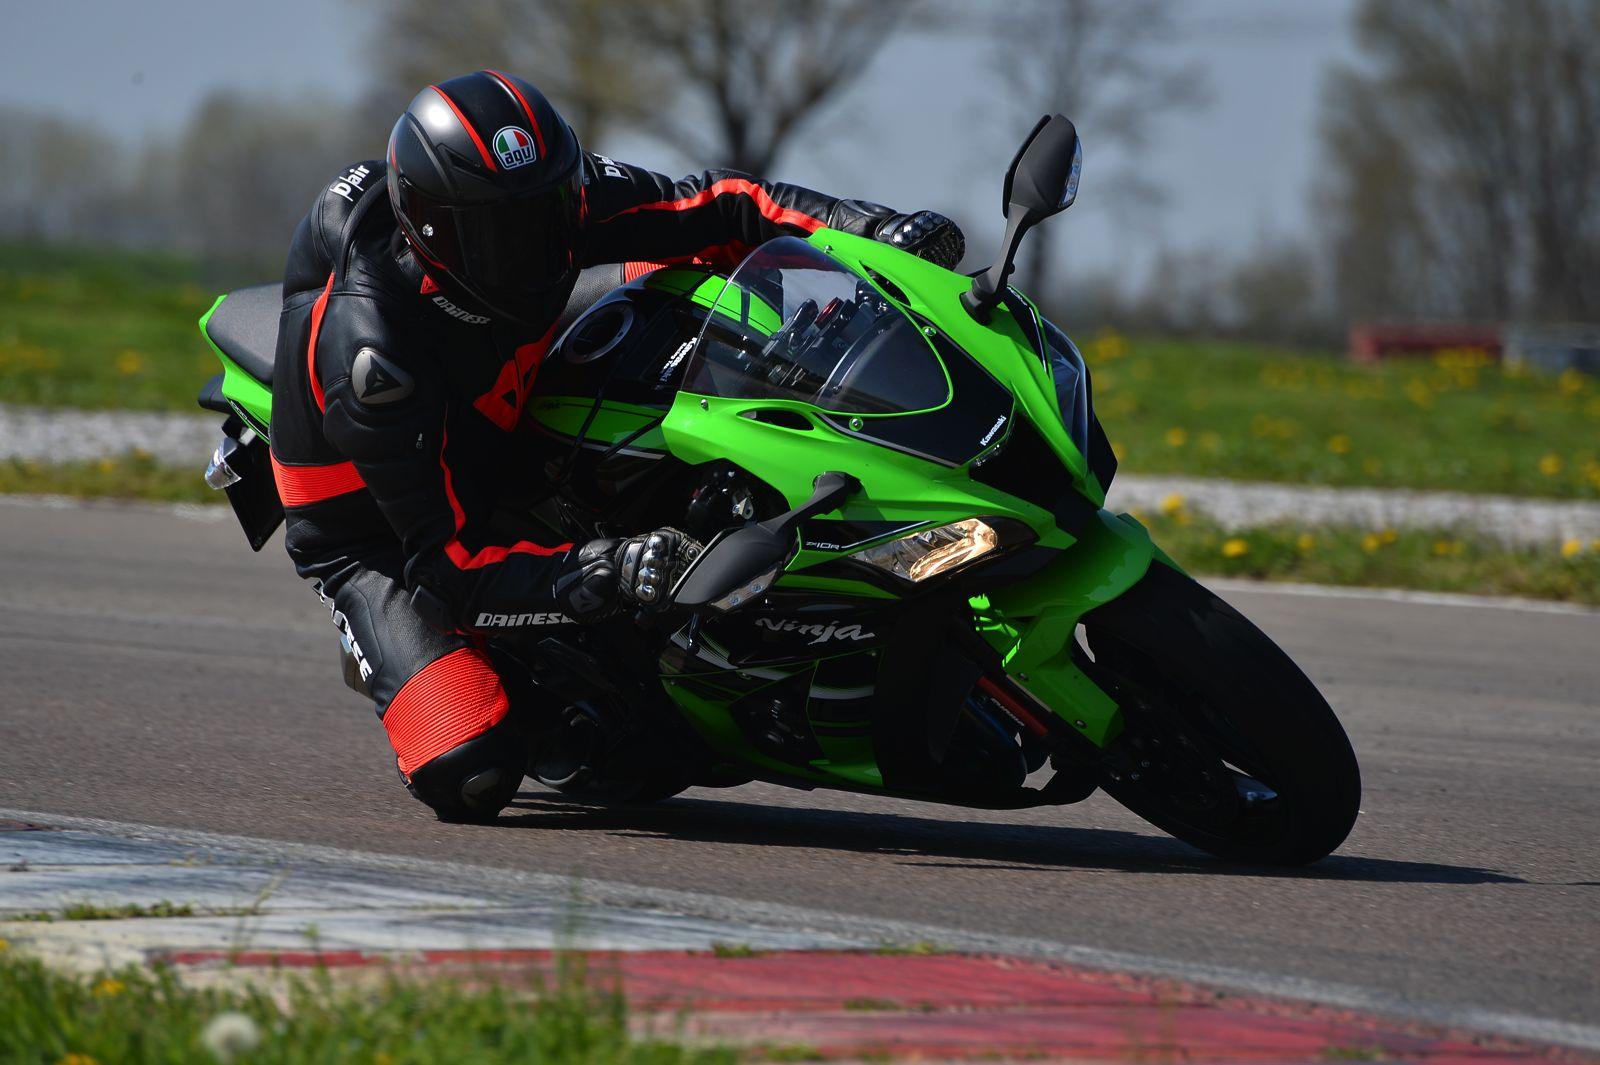 Kawasaki Ninja Zx 10r 2016 Prezzo Scheda Tecnica Dati